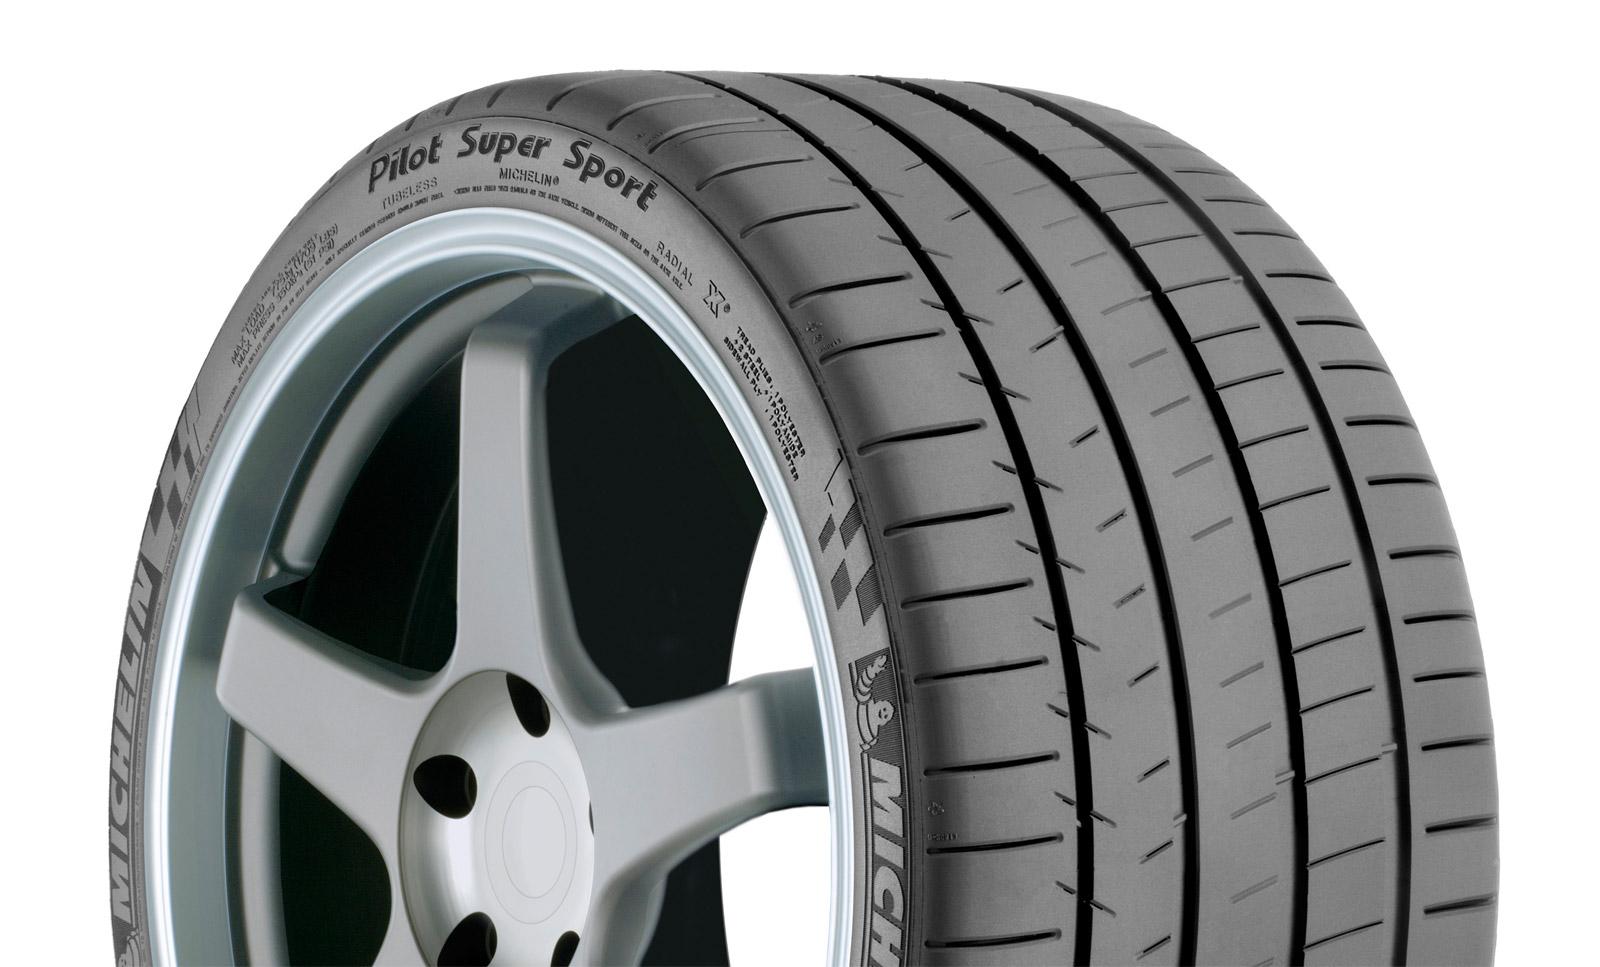 A Close Look At The Ferrari F12 Berlinetta S Michelin Tires